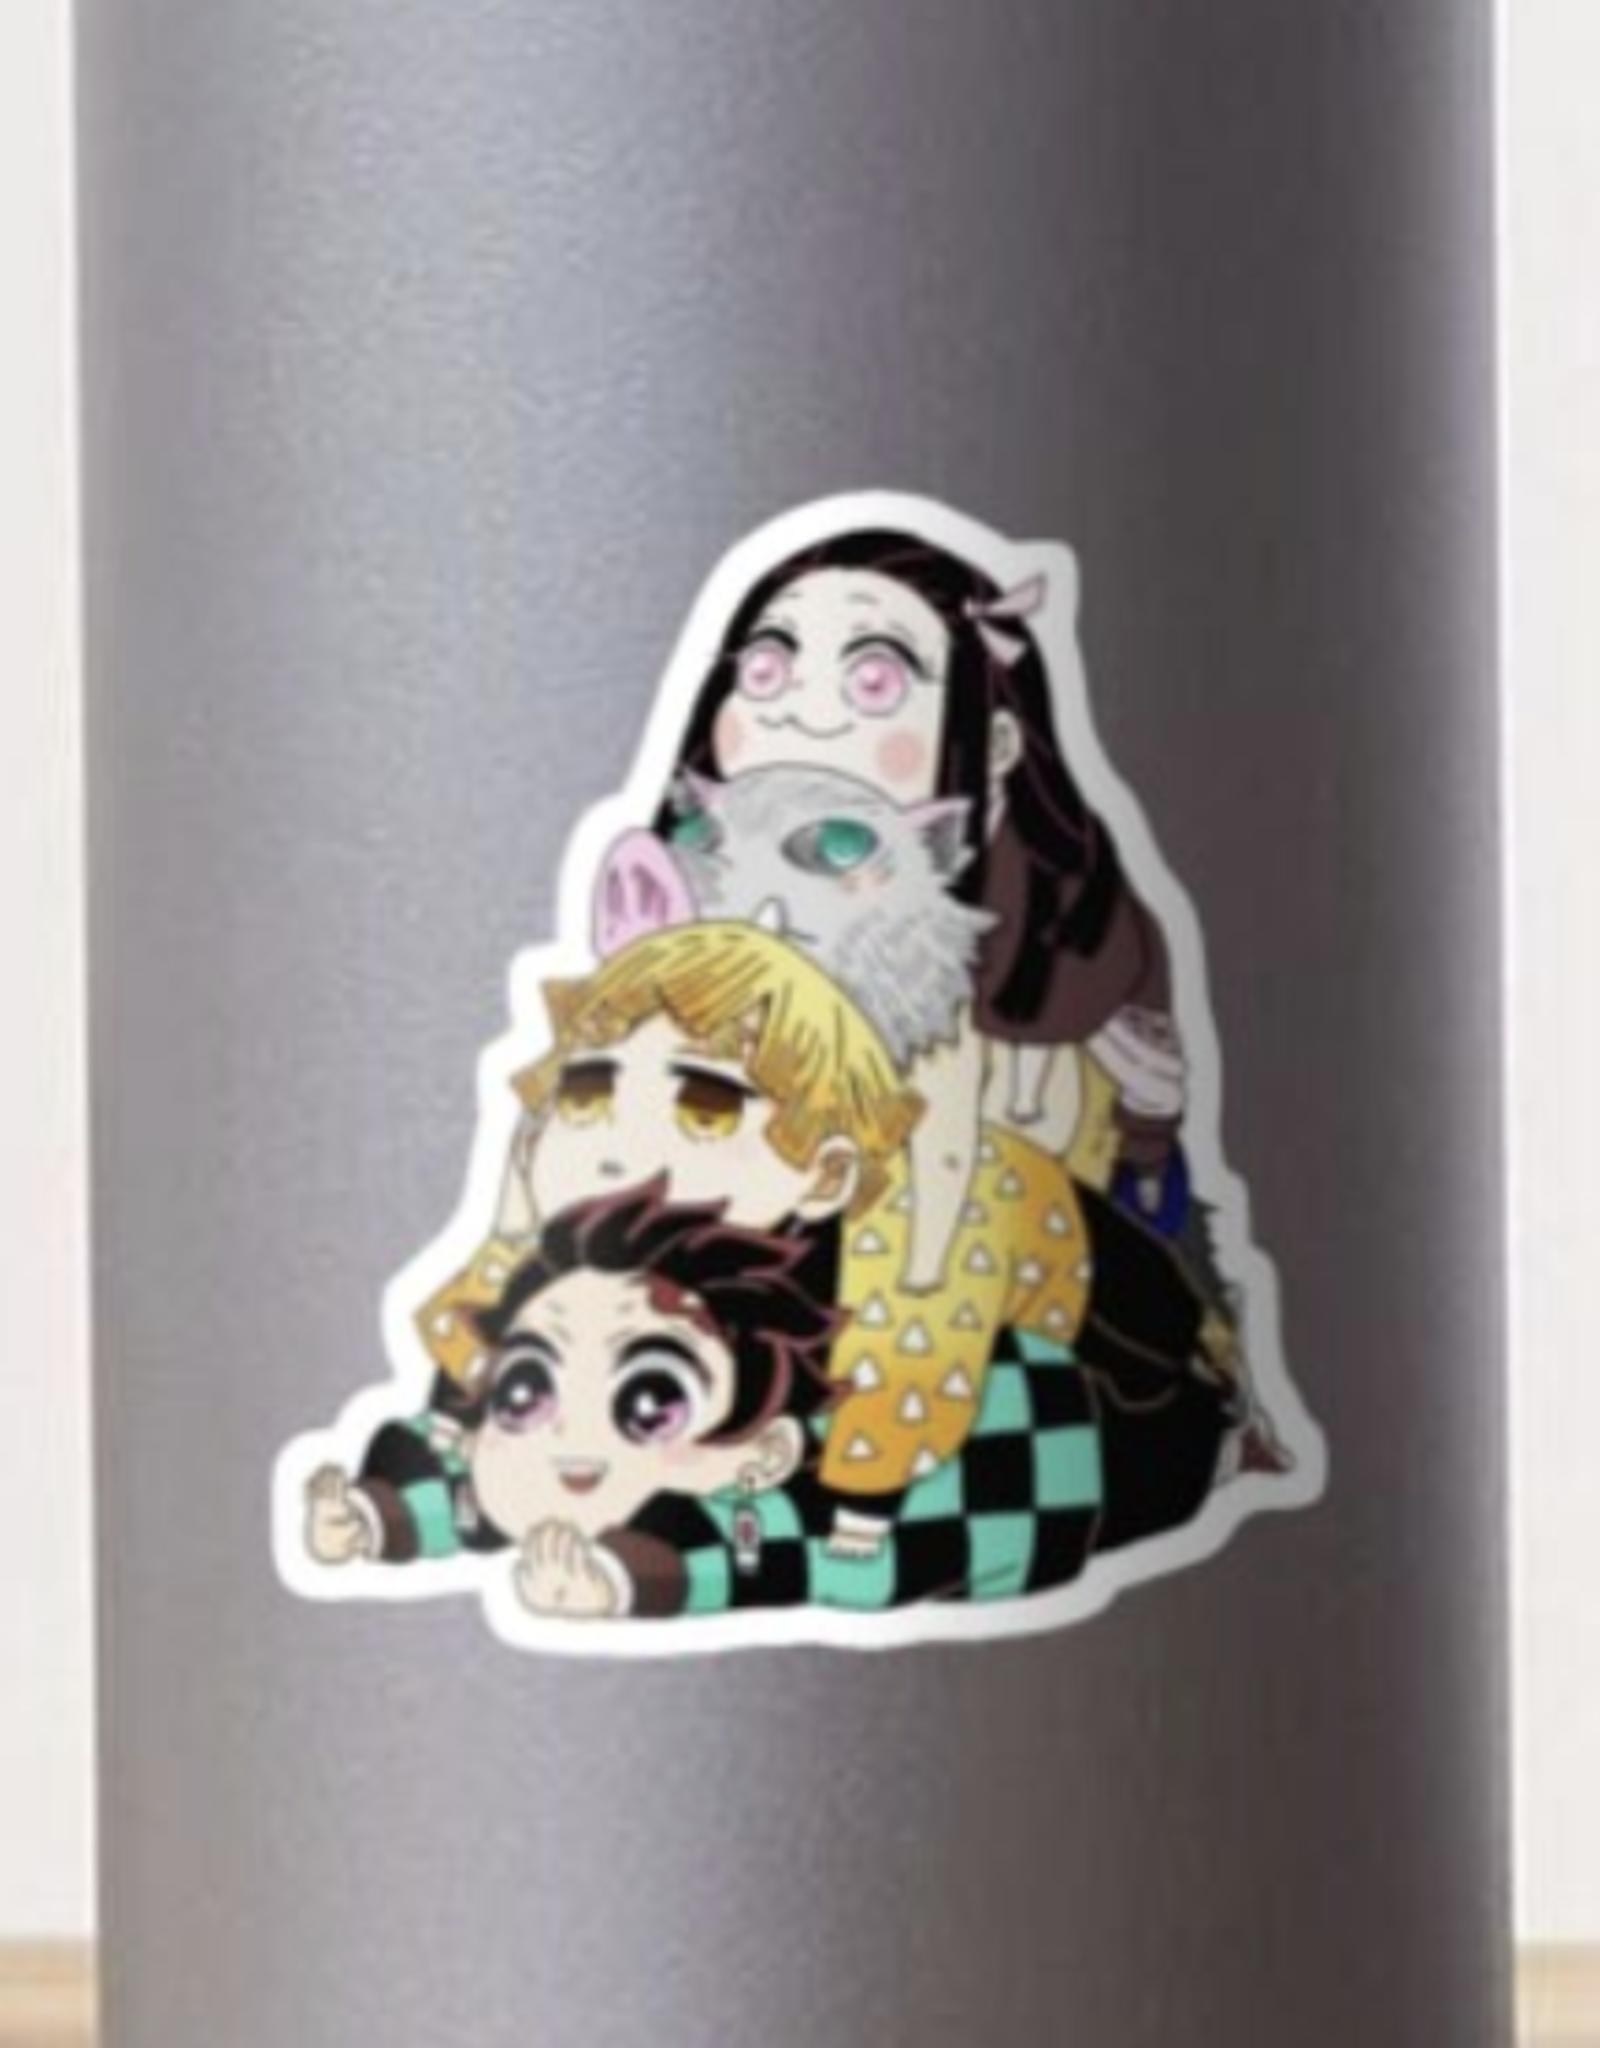 Demon Slayer Gang Cute Sticker